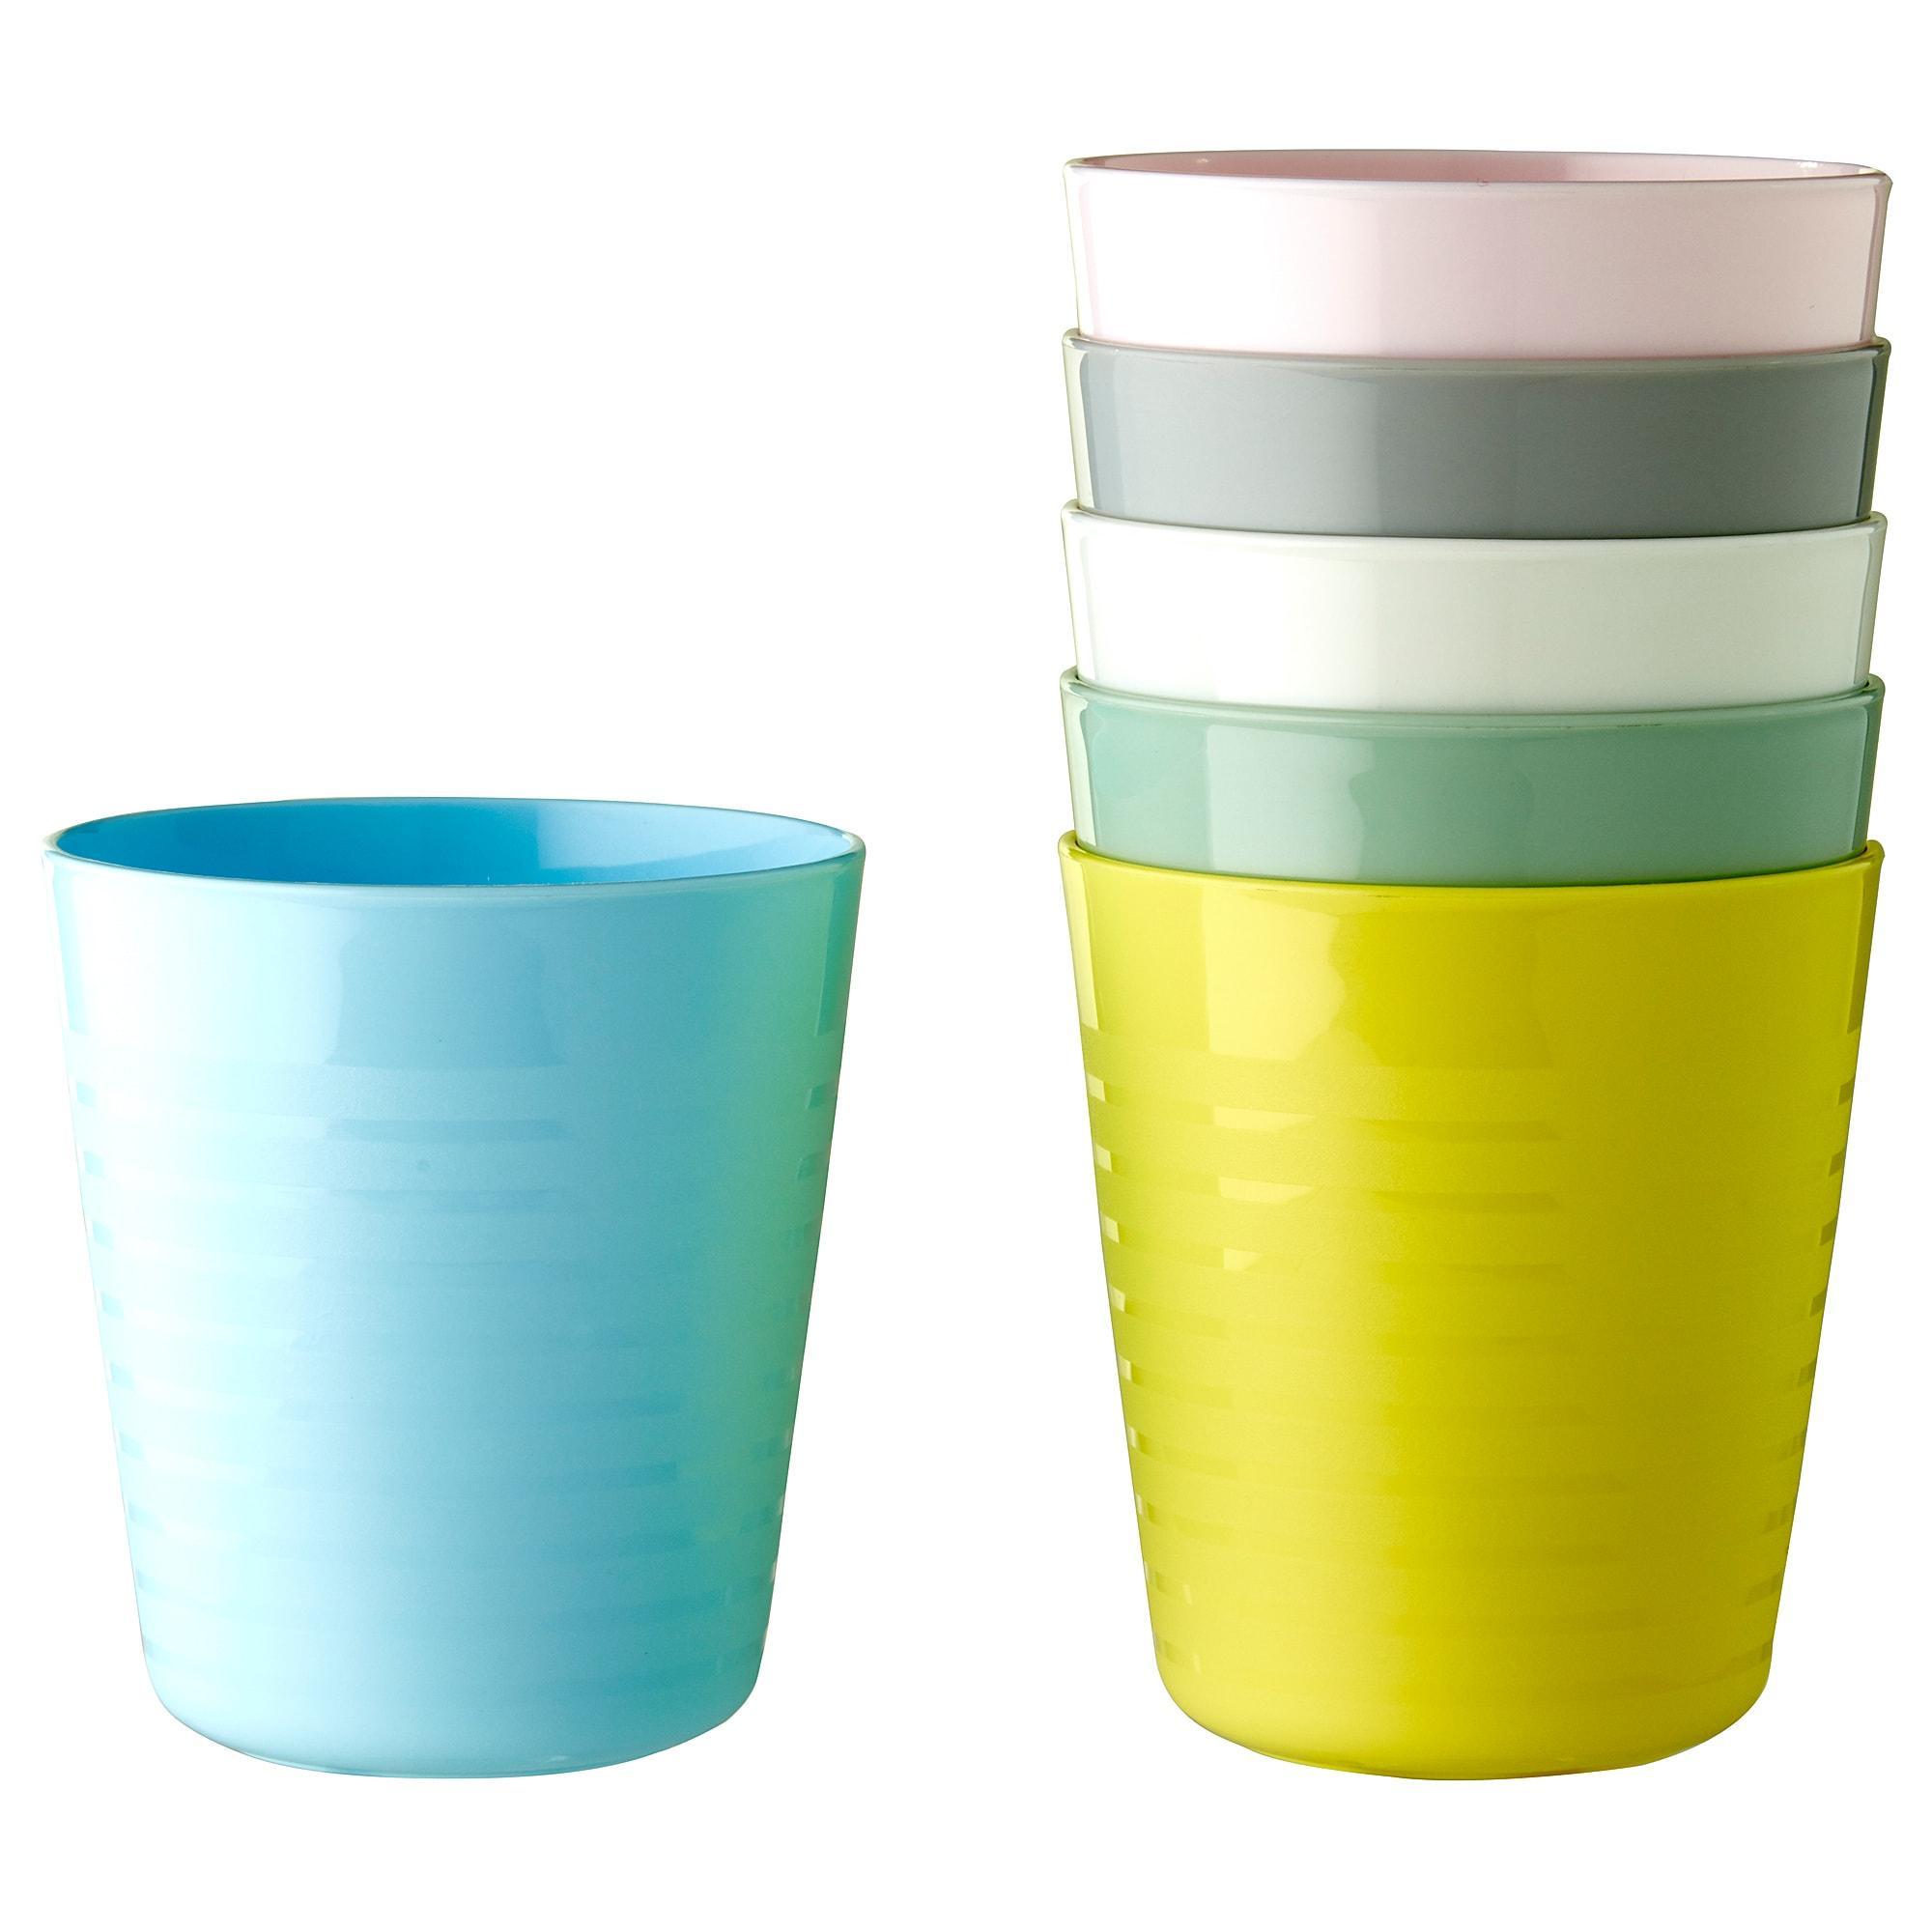 Ikea Kalas Gelas Plastik Anak Mug, Aneka Warna Warni Set Isi 6 Pcs By Health And Beauty Solution.